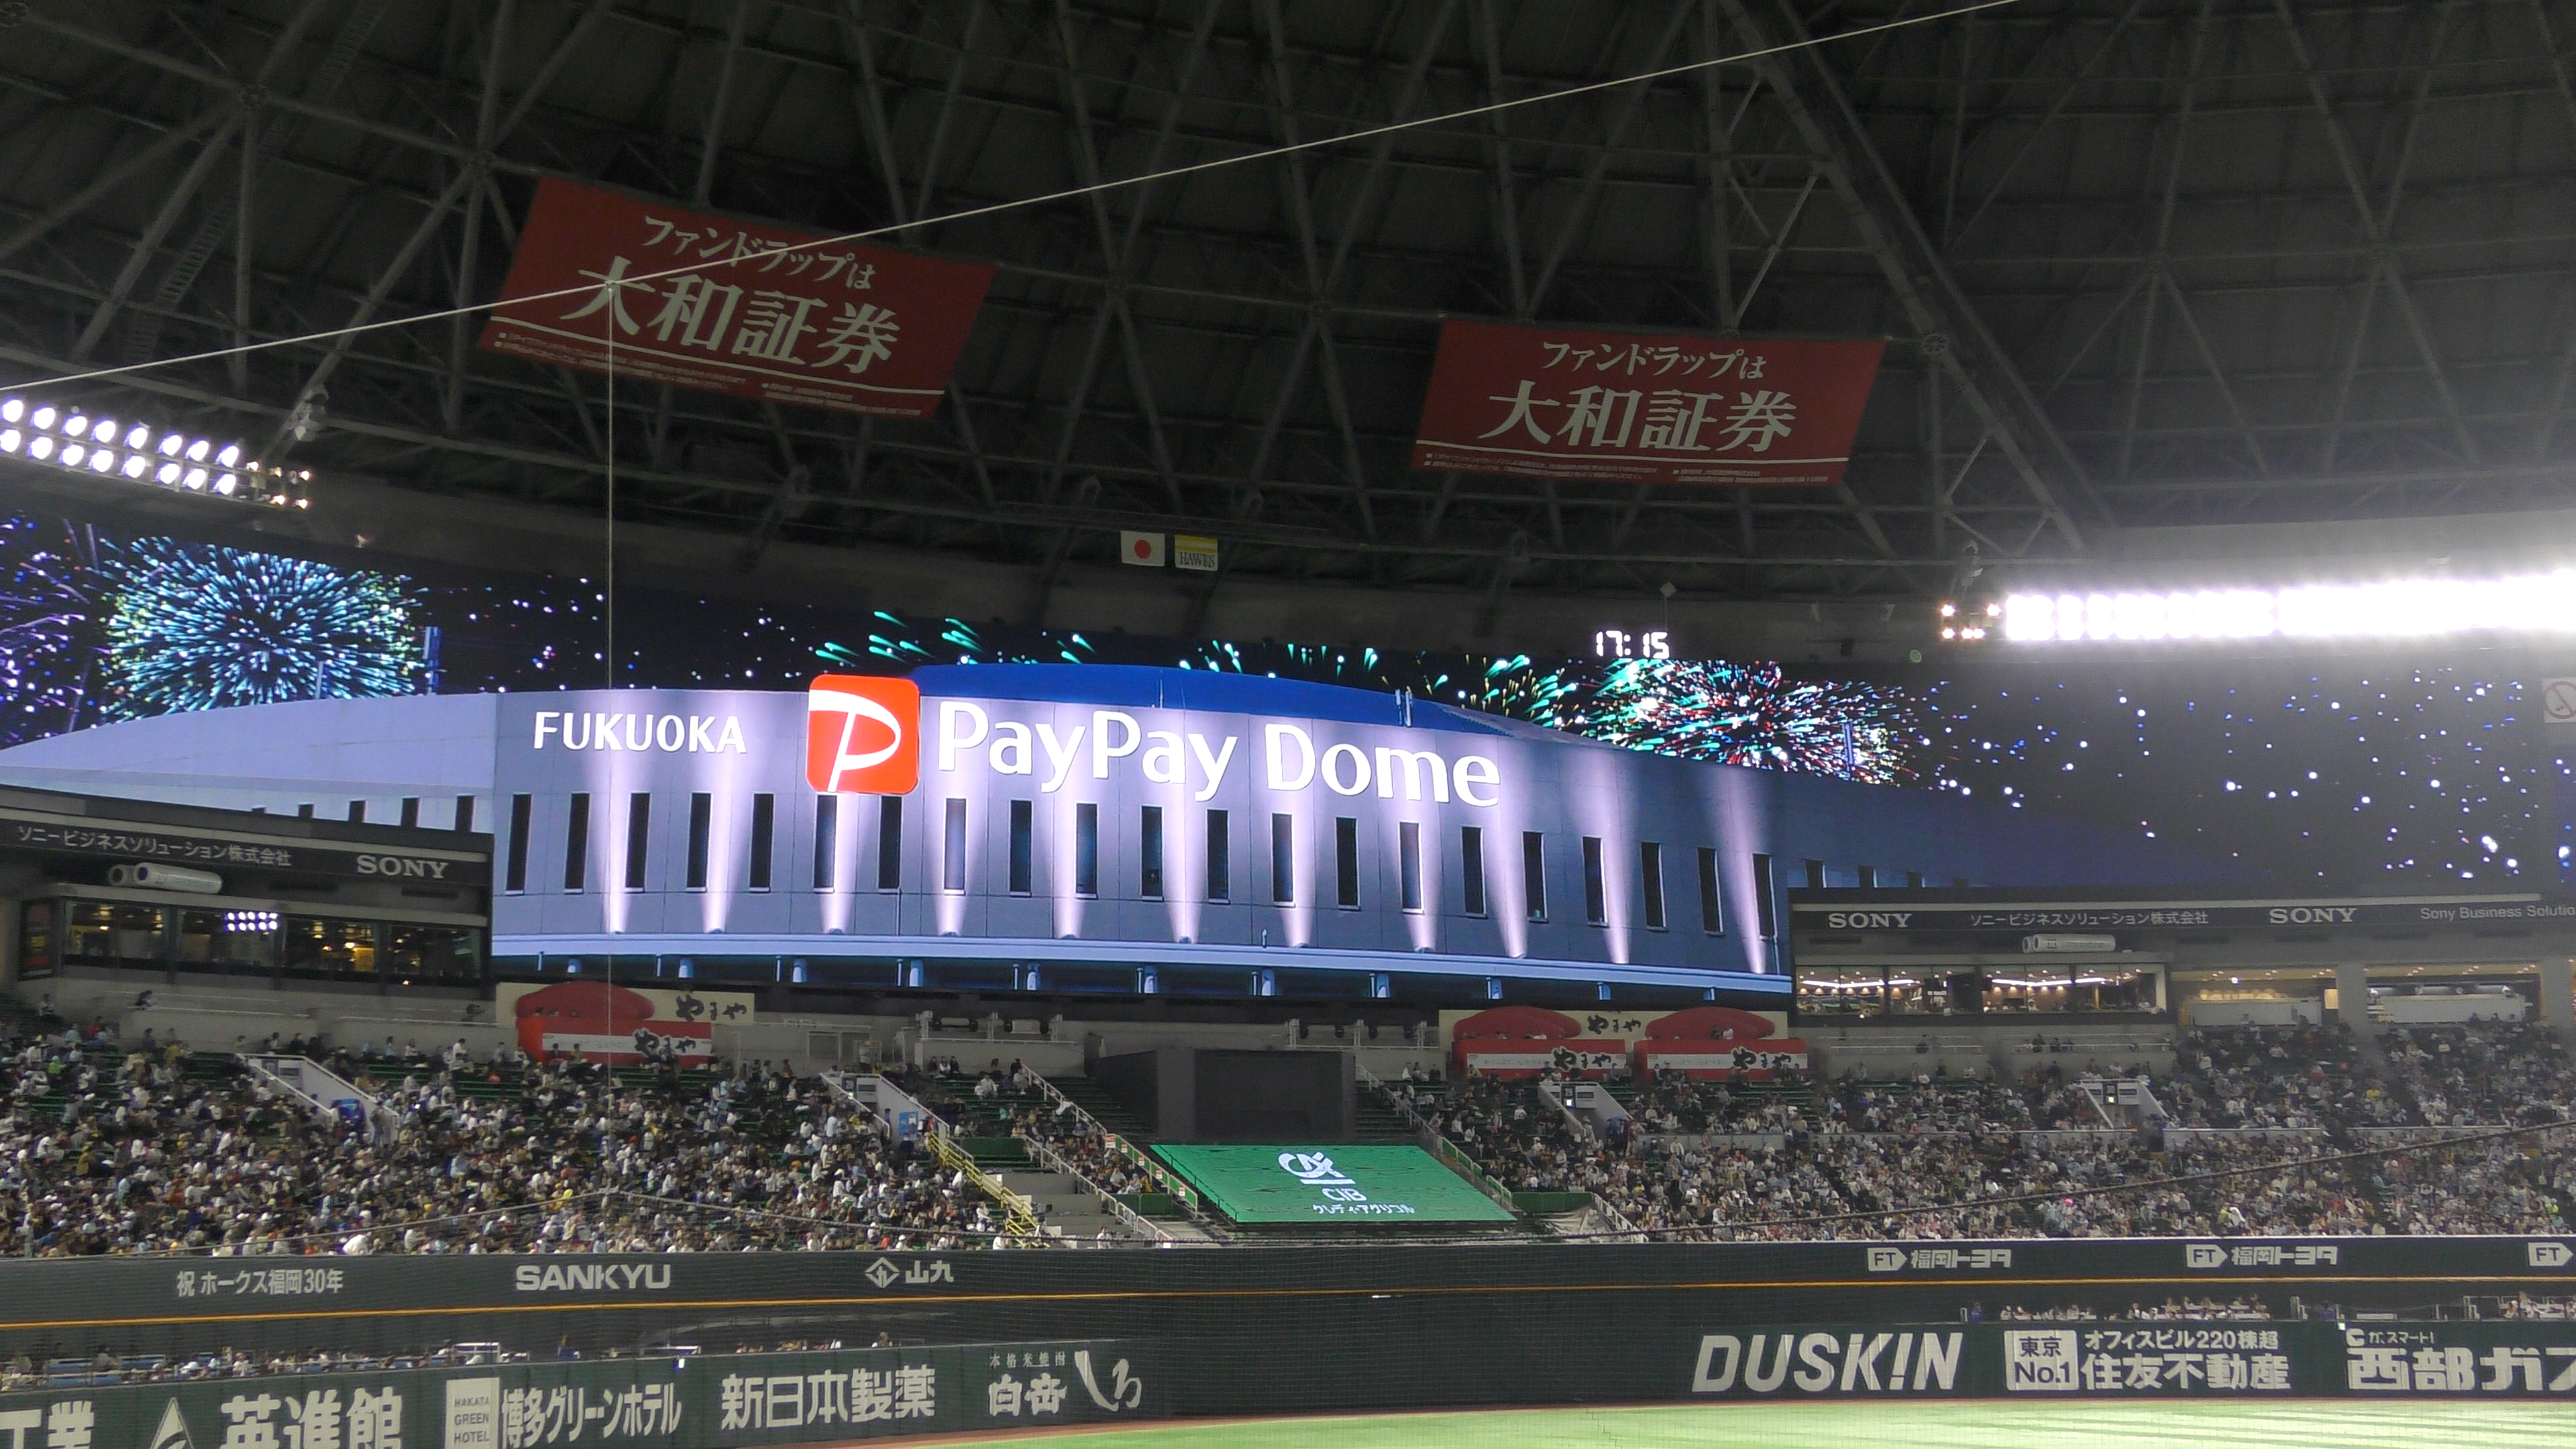 Paypay ドーム 福岡